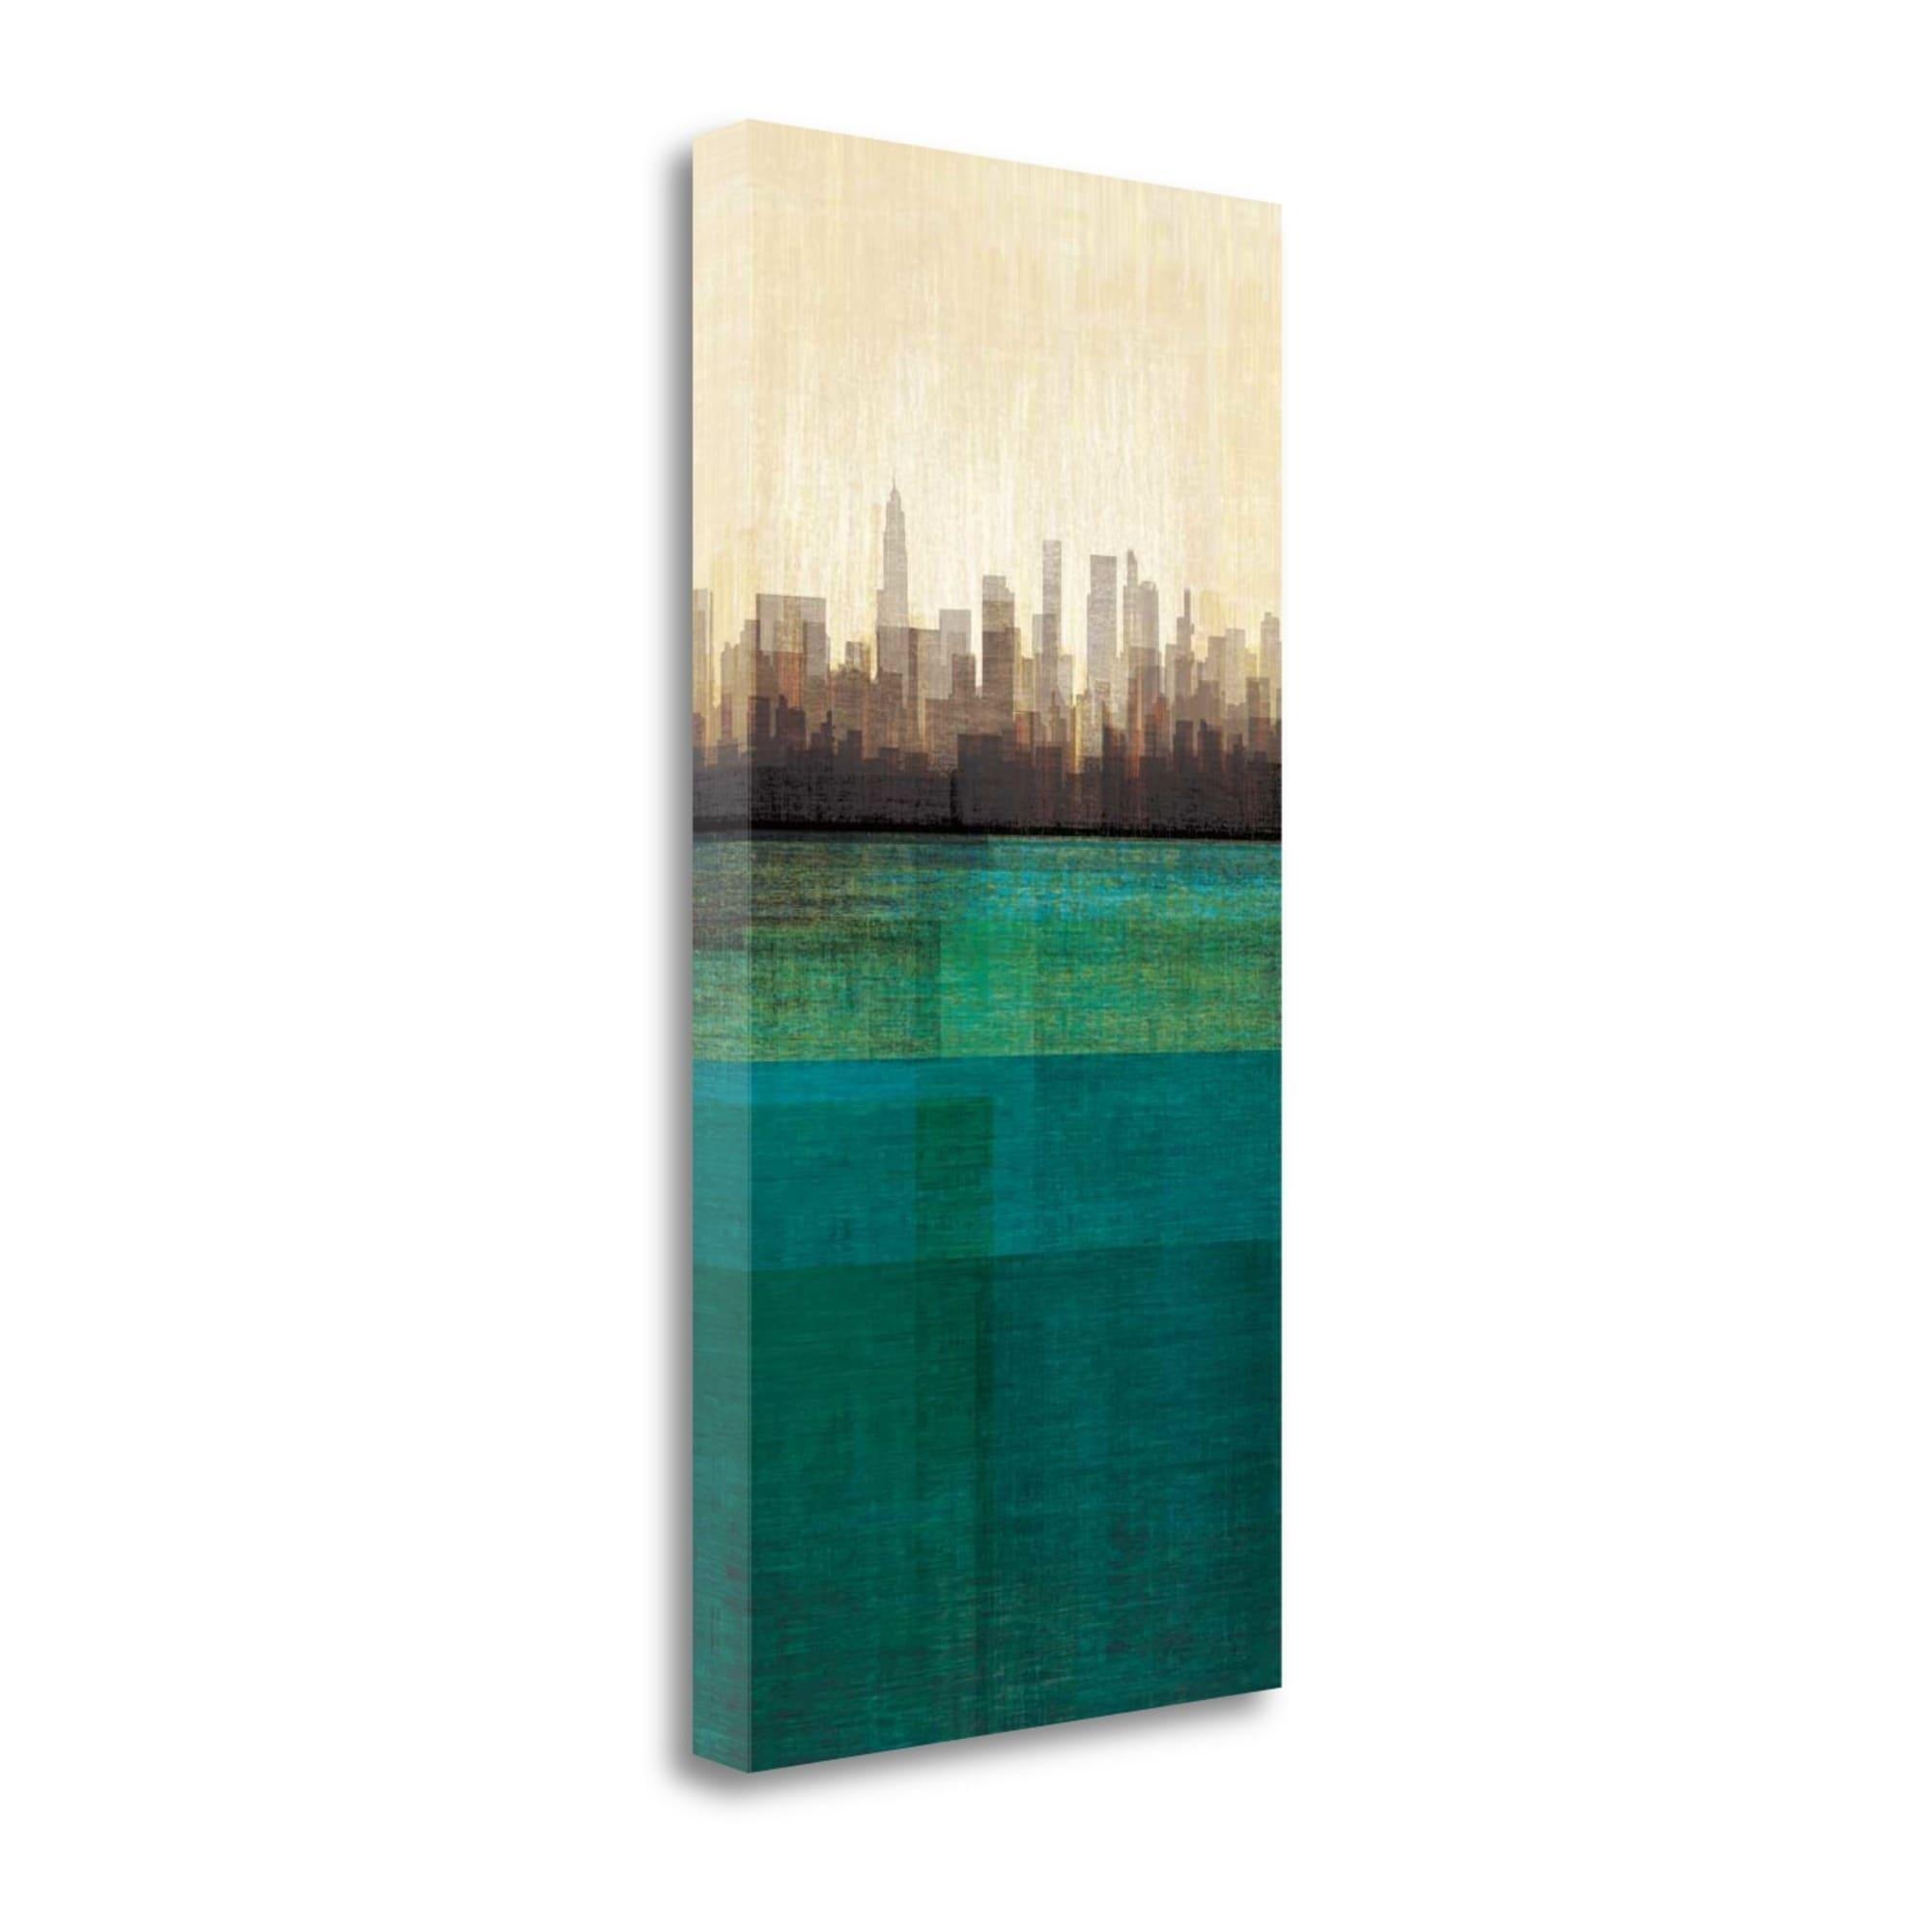 Amori De metropolitan jewel-box - emeraldamori, gallery wrap canvas